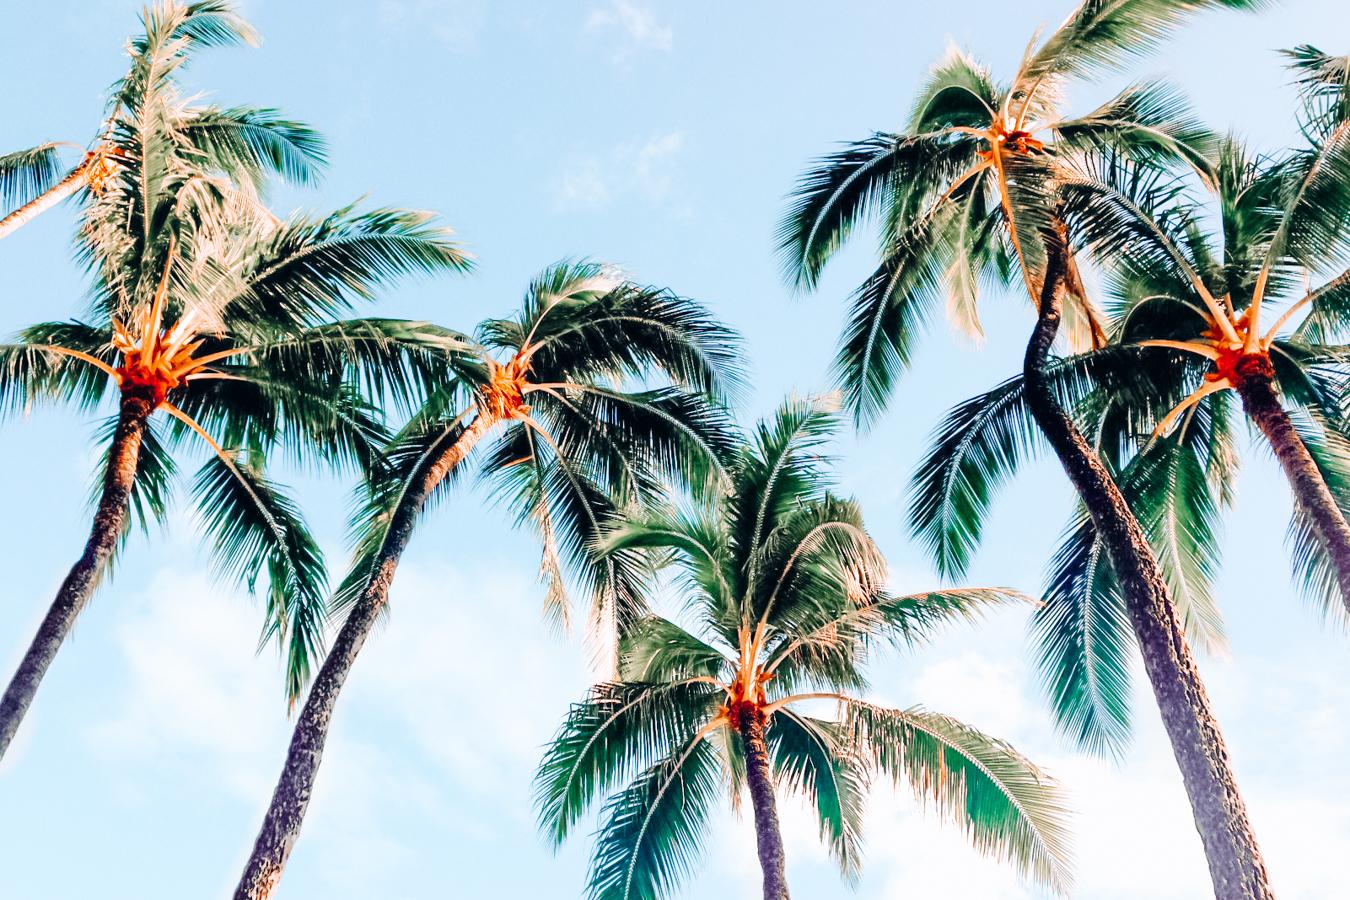 Palm trees in Oahu